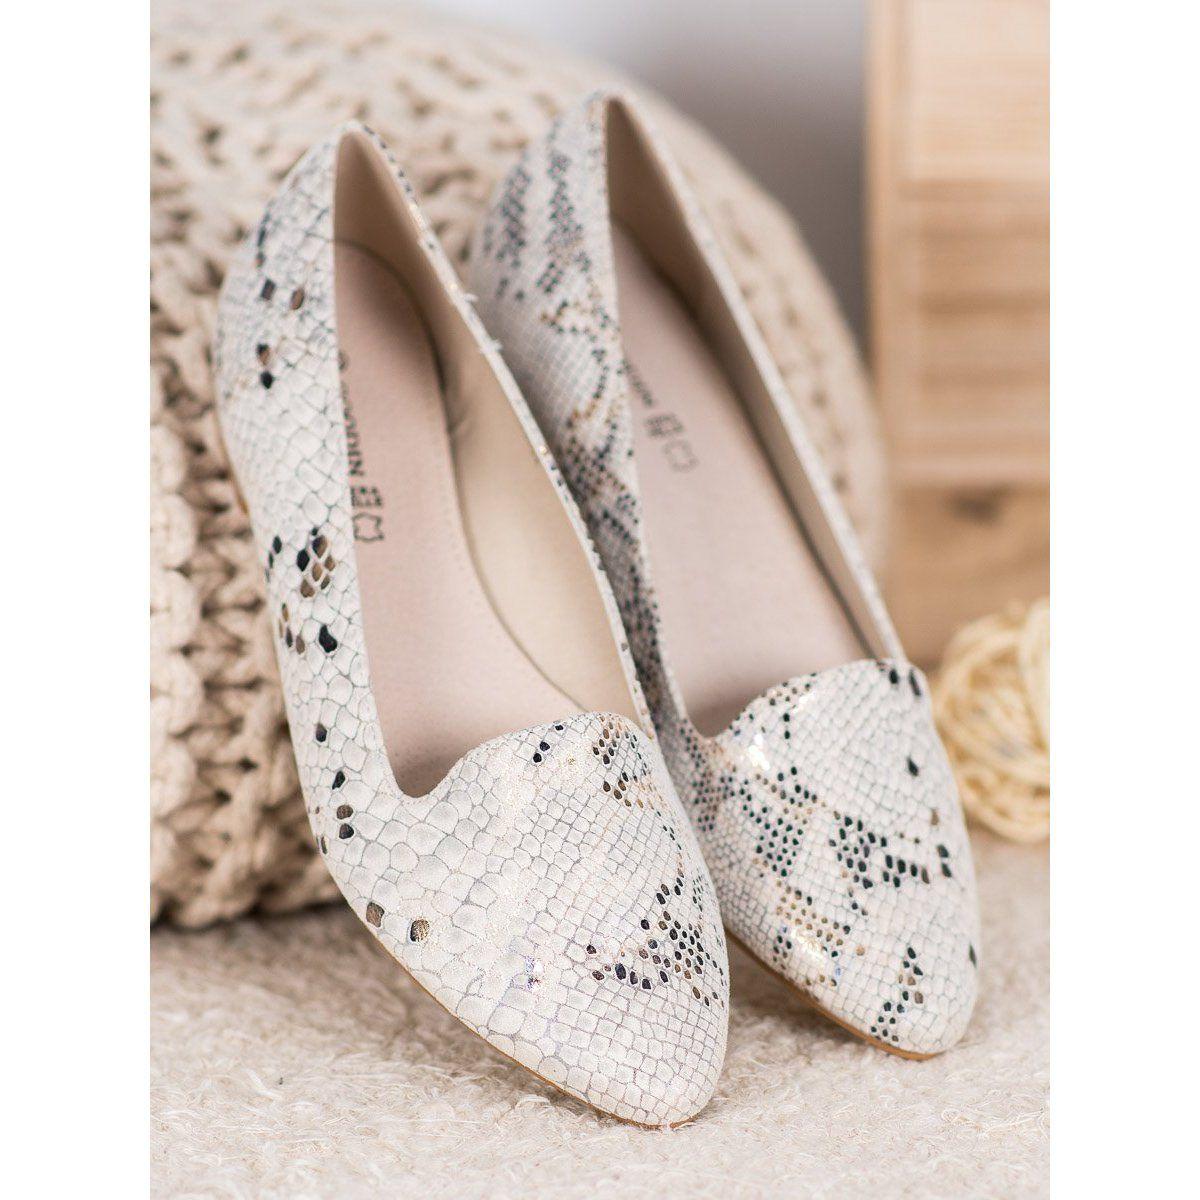 Goodin Baleriny Snake Print Bezowy Wedding Shoe Shoes Flats